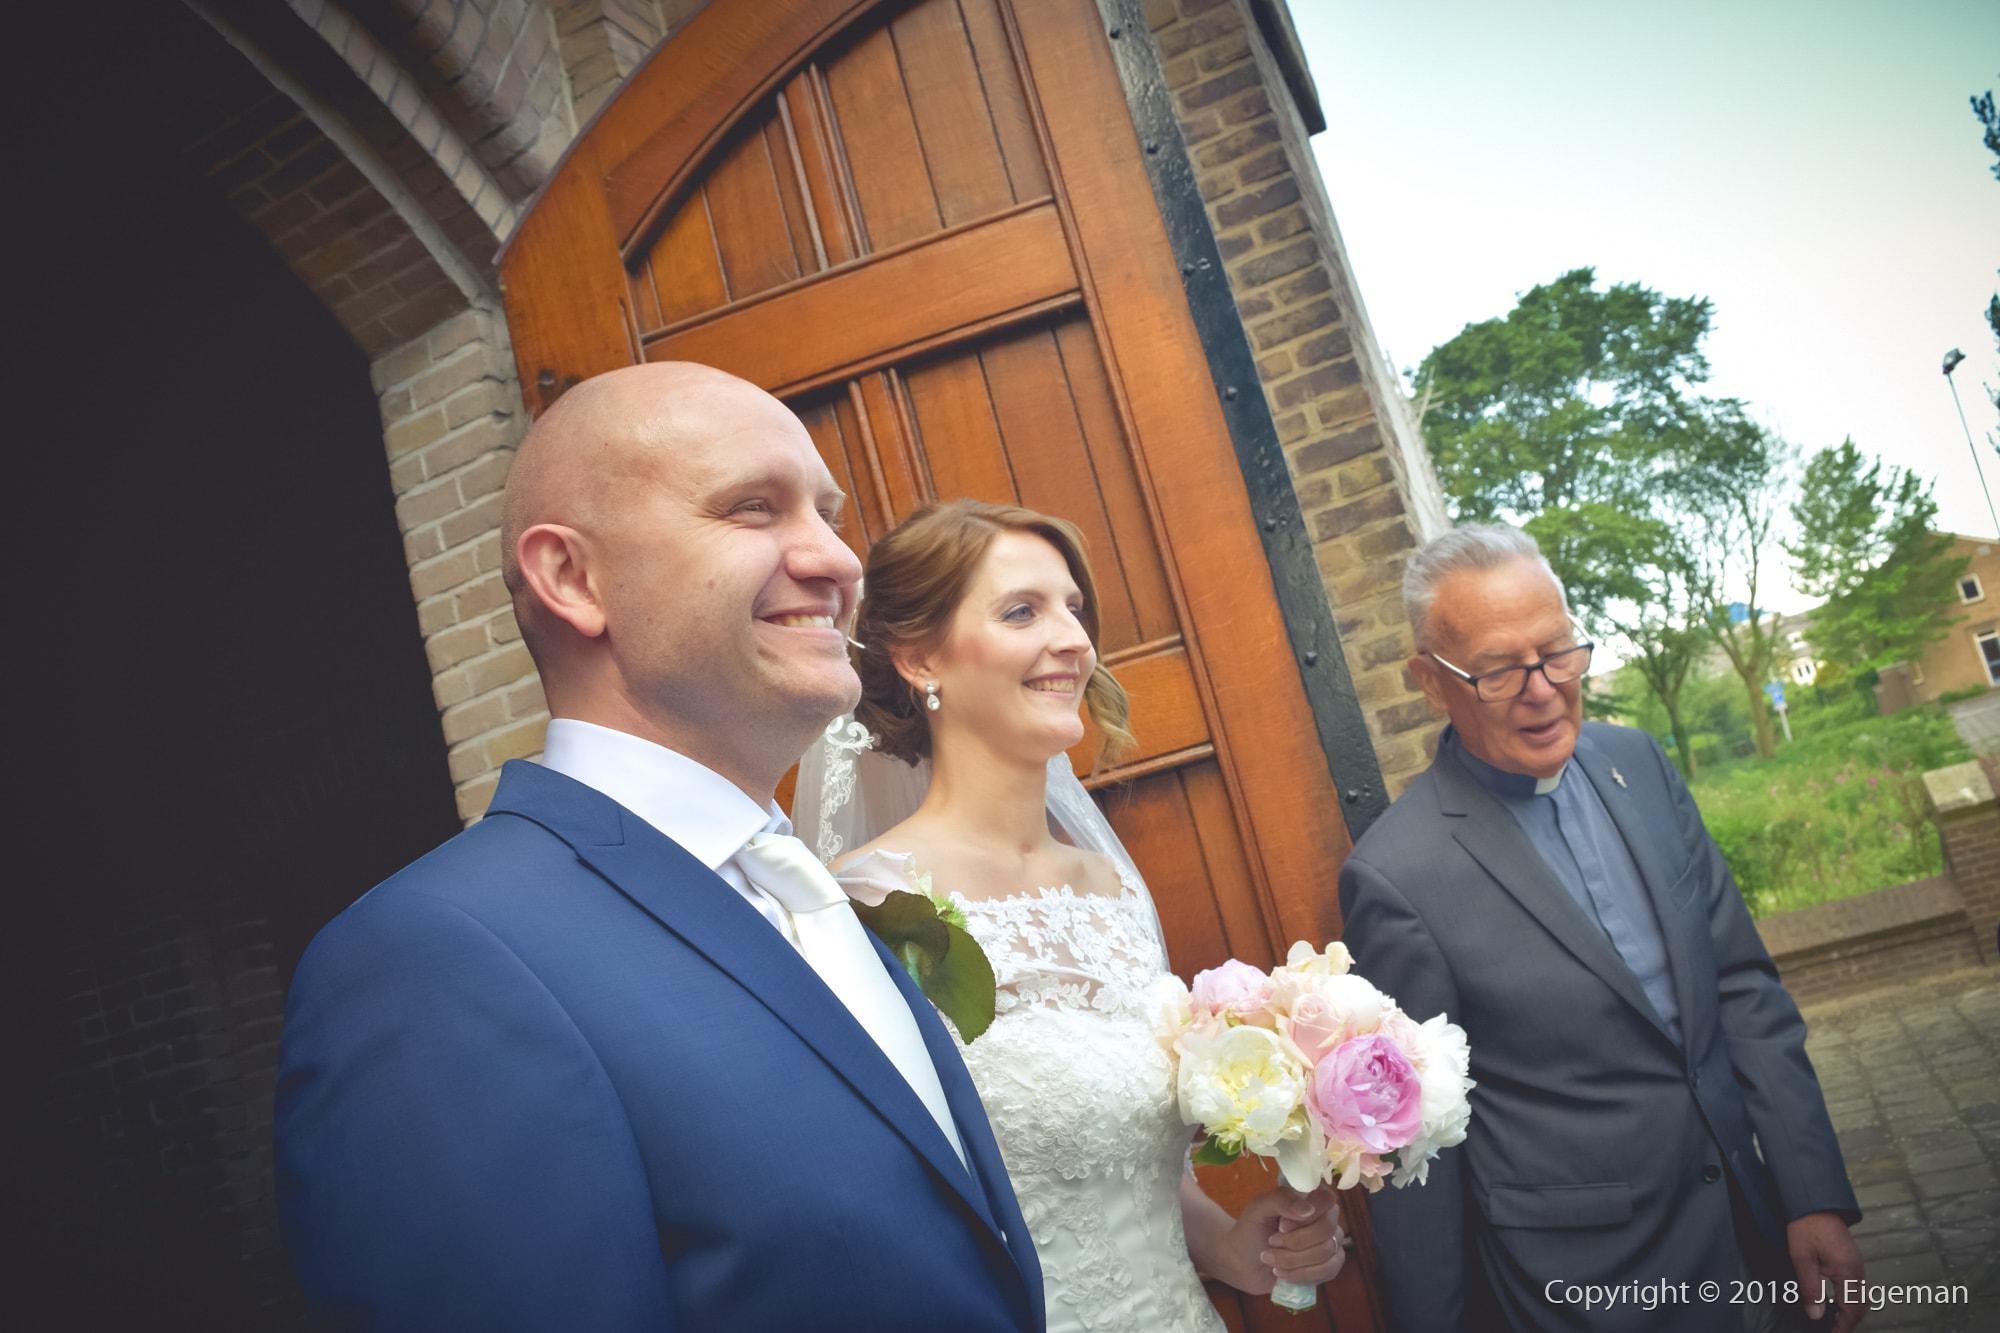 Bruiloft fotografie - Marquette Heemskerk (1)